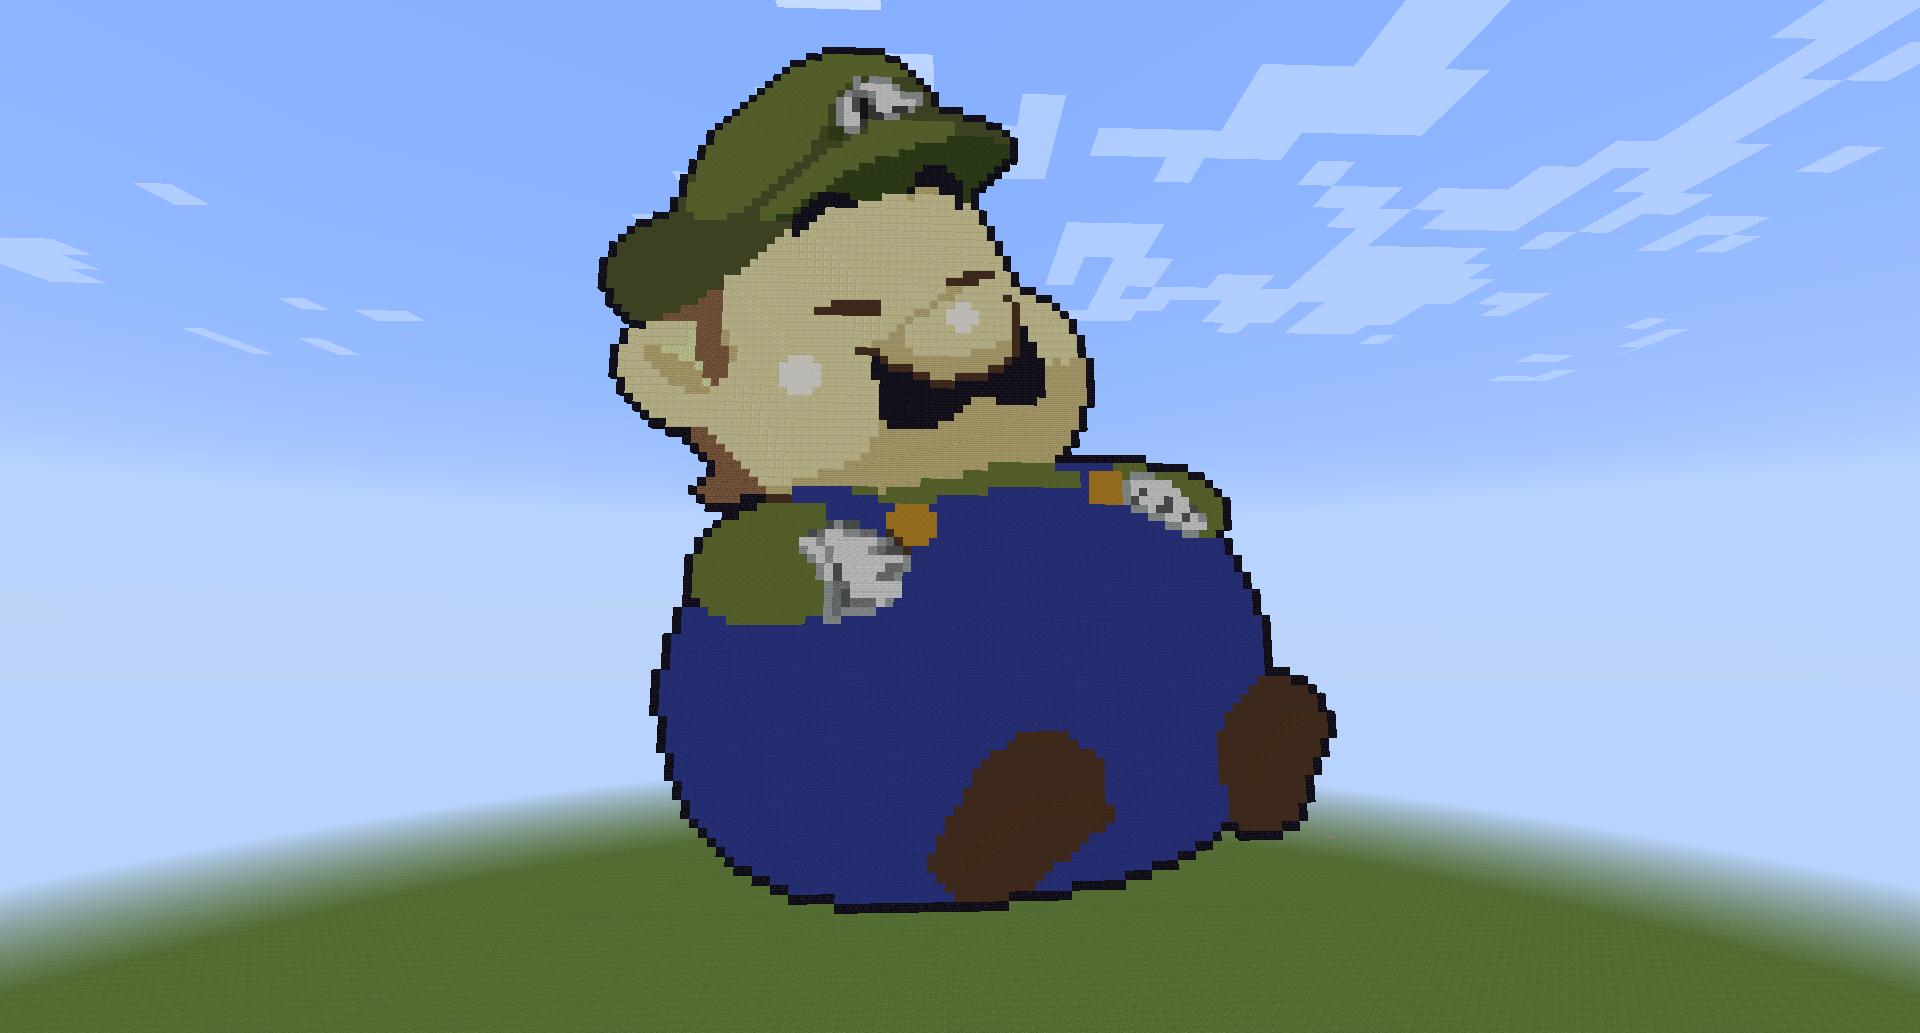 Baby Luigi Pixel Art Chubby Luigi Pixel Art by Minecraft Diamond Wallpaper 1920x1080